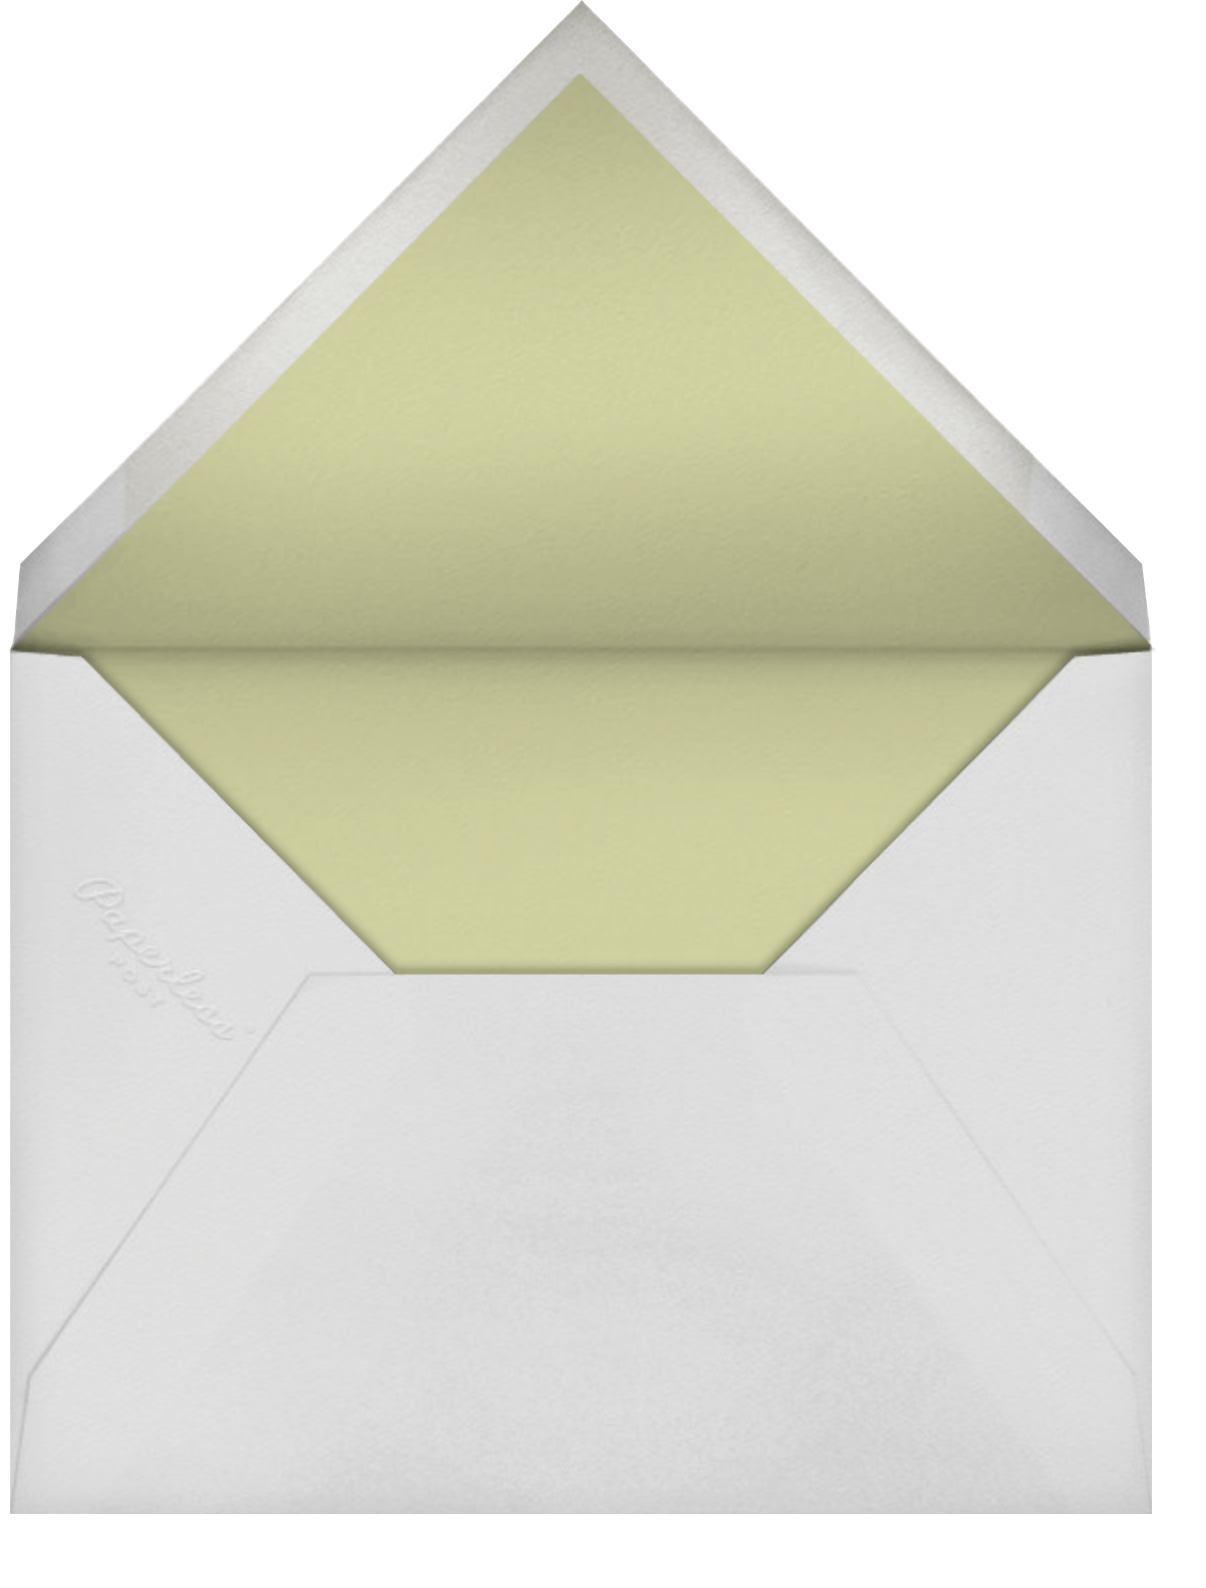 Palmier I (Stationery) - Celery - Paperless Post - null - envelope back